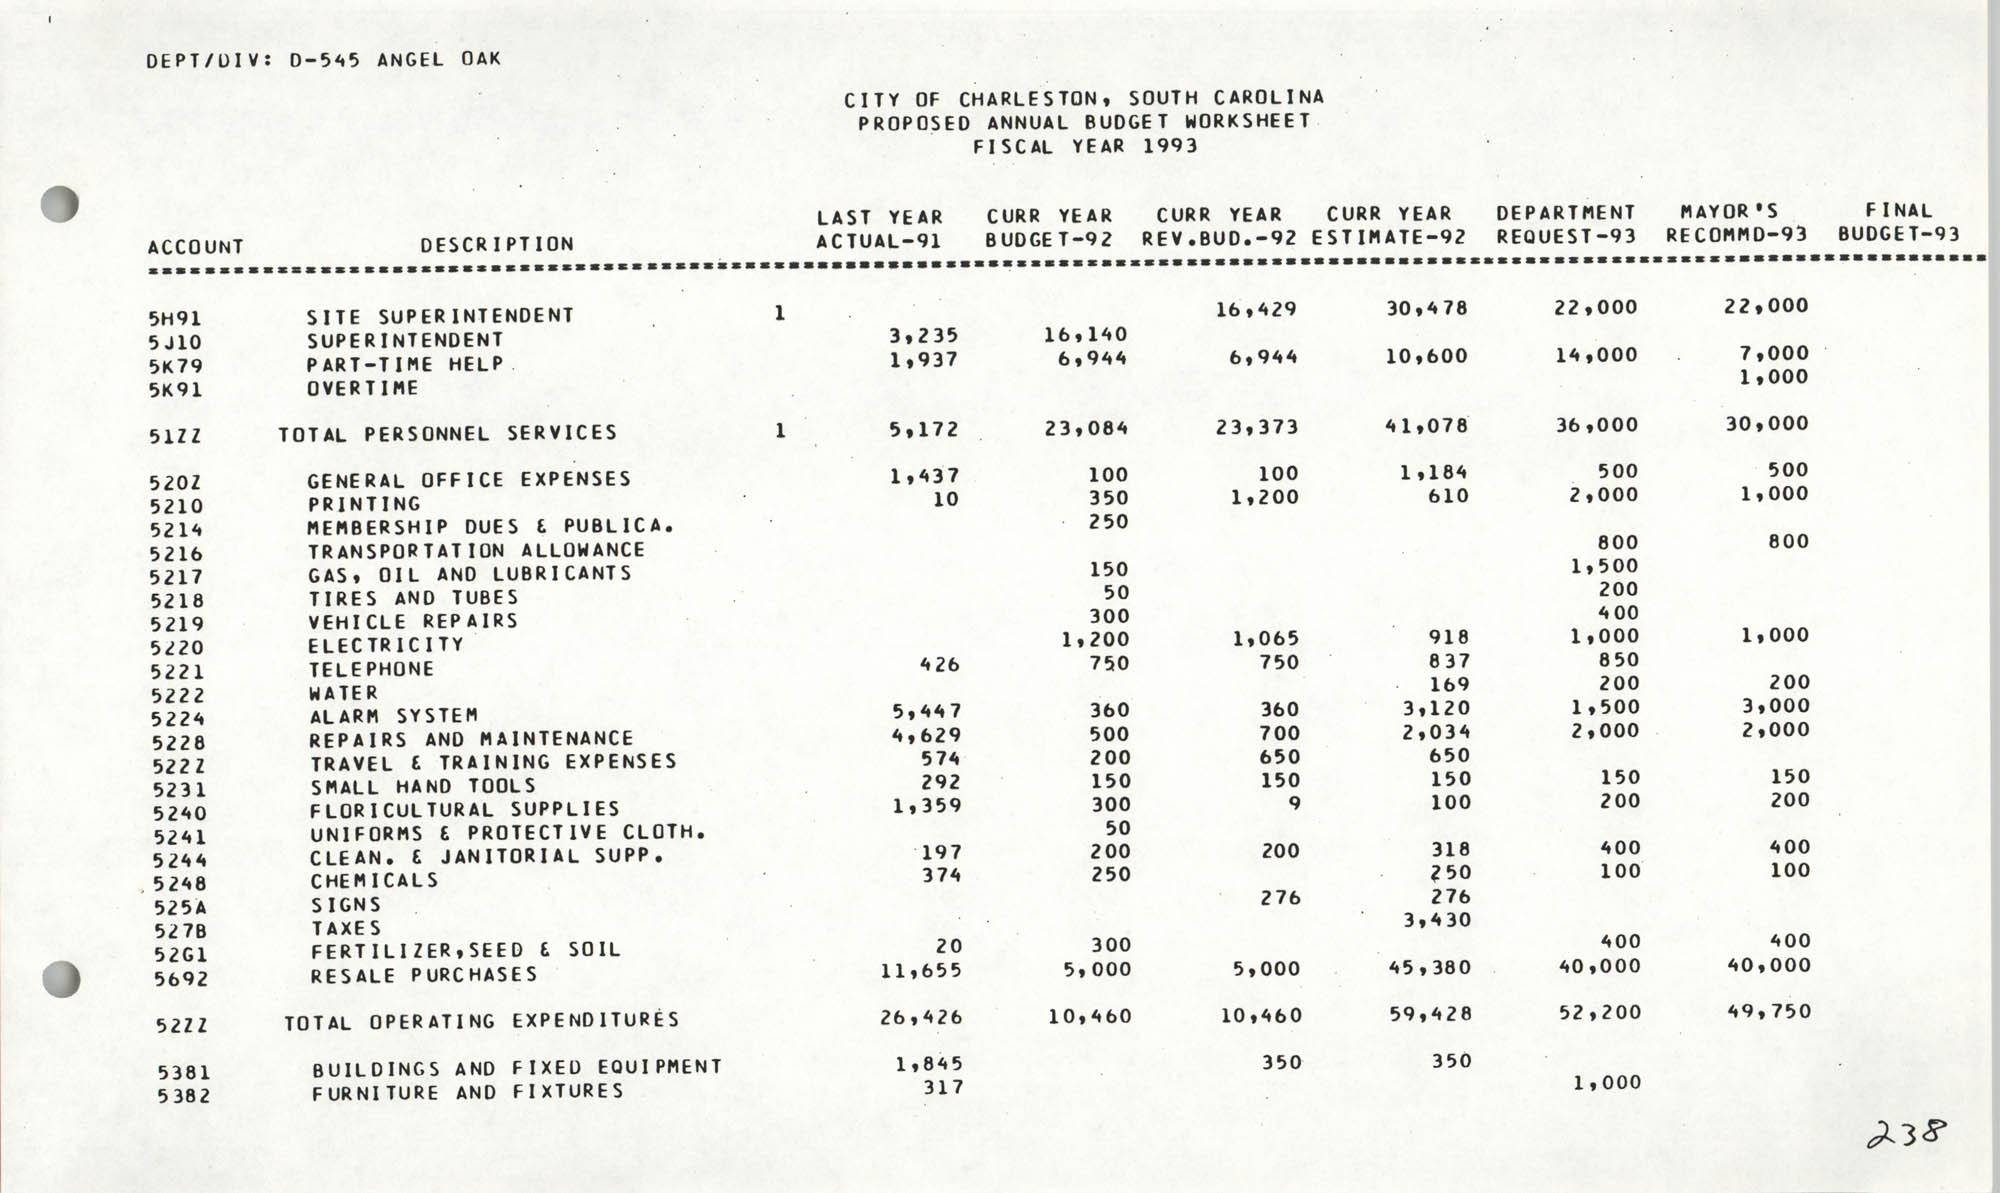 The City Council of Charleston, South Carolina, 1993 Budget, Page 238